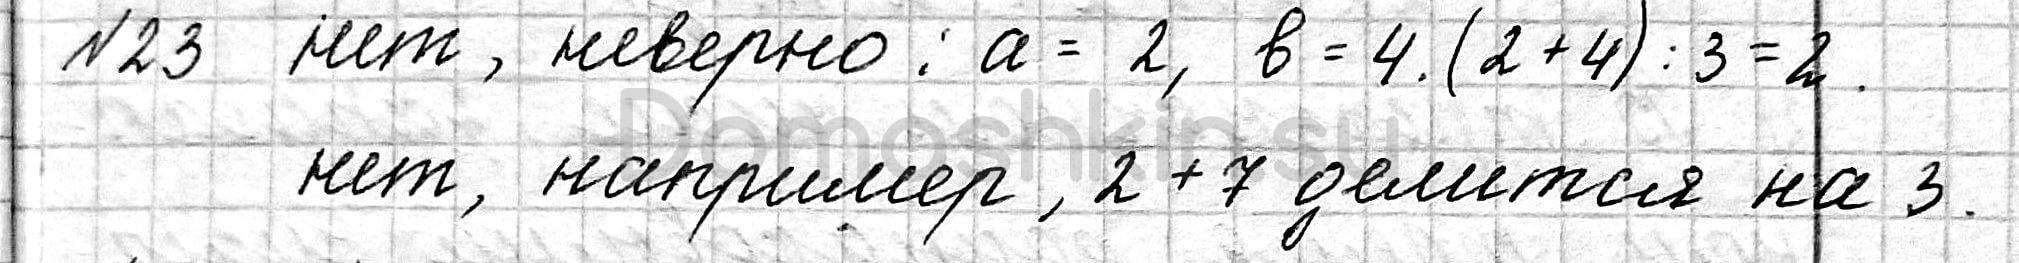 Математика 6 класс учебник Мерзляк номер 23 решение